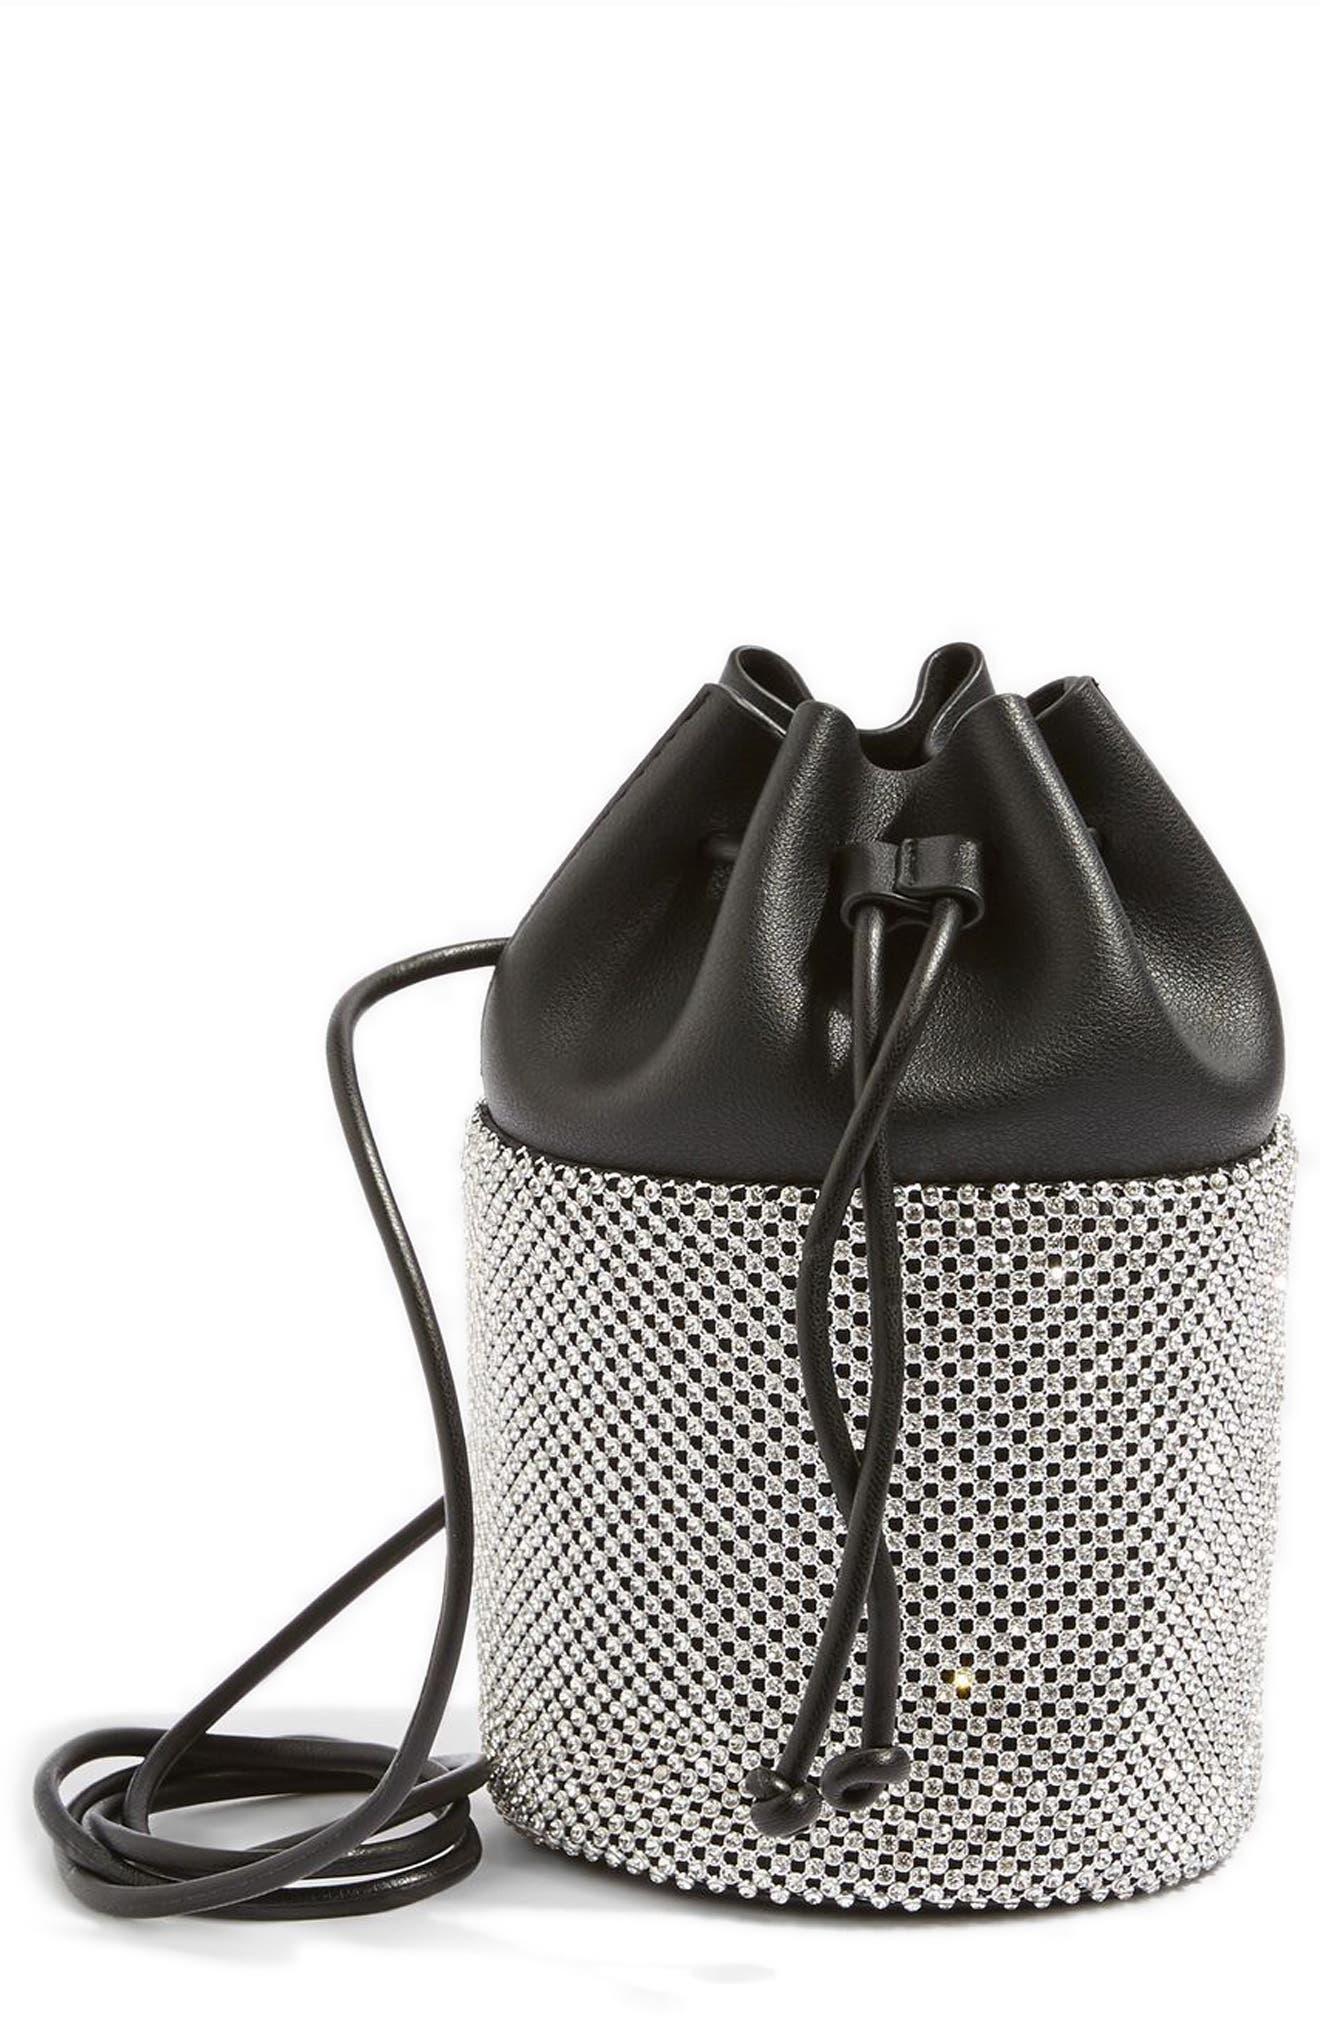 Topshop Ruben Diamante Faux Leather Bucket Crossbody Bag